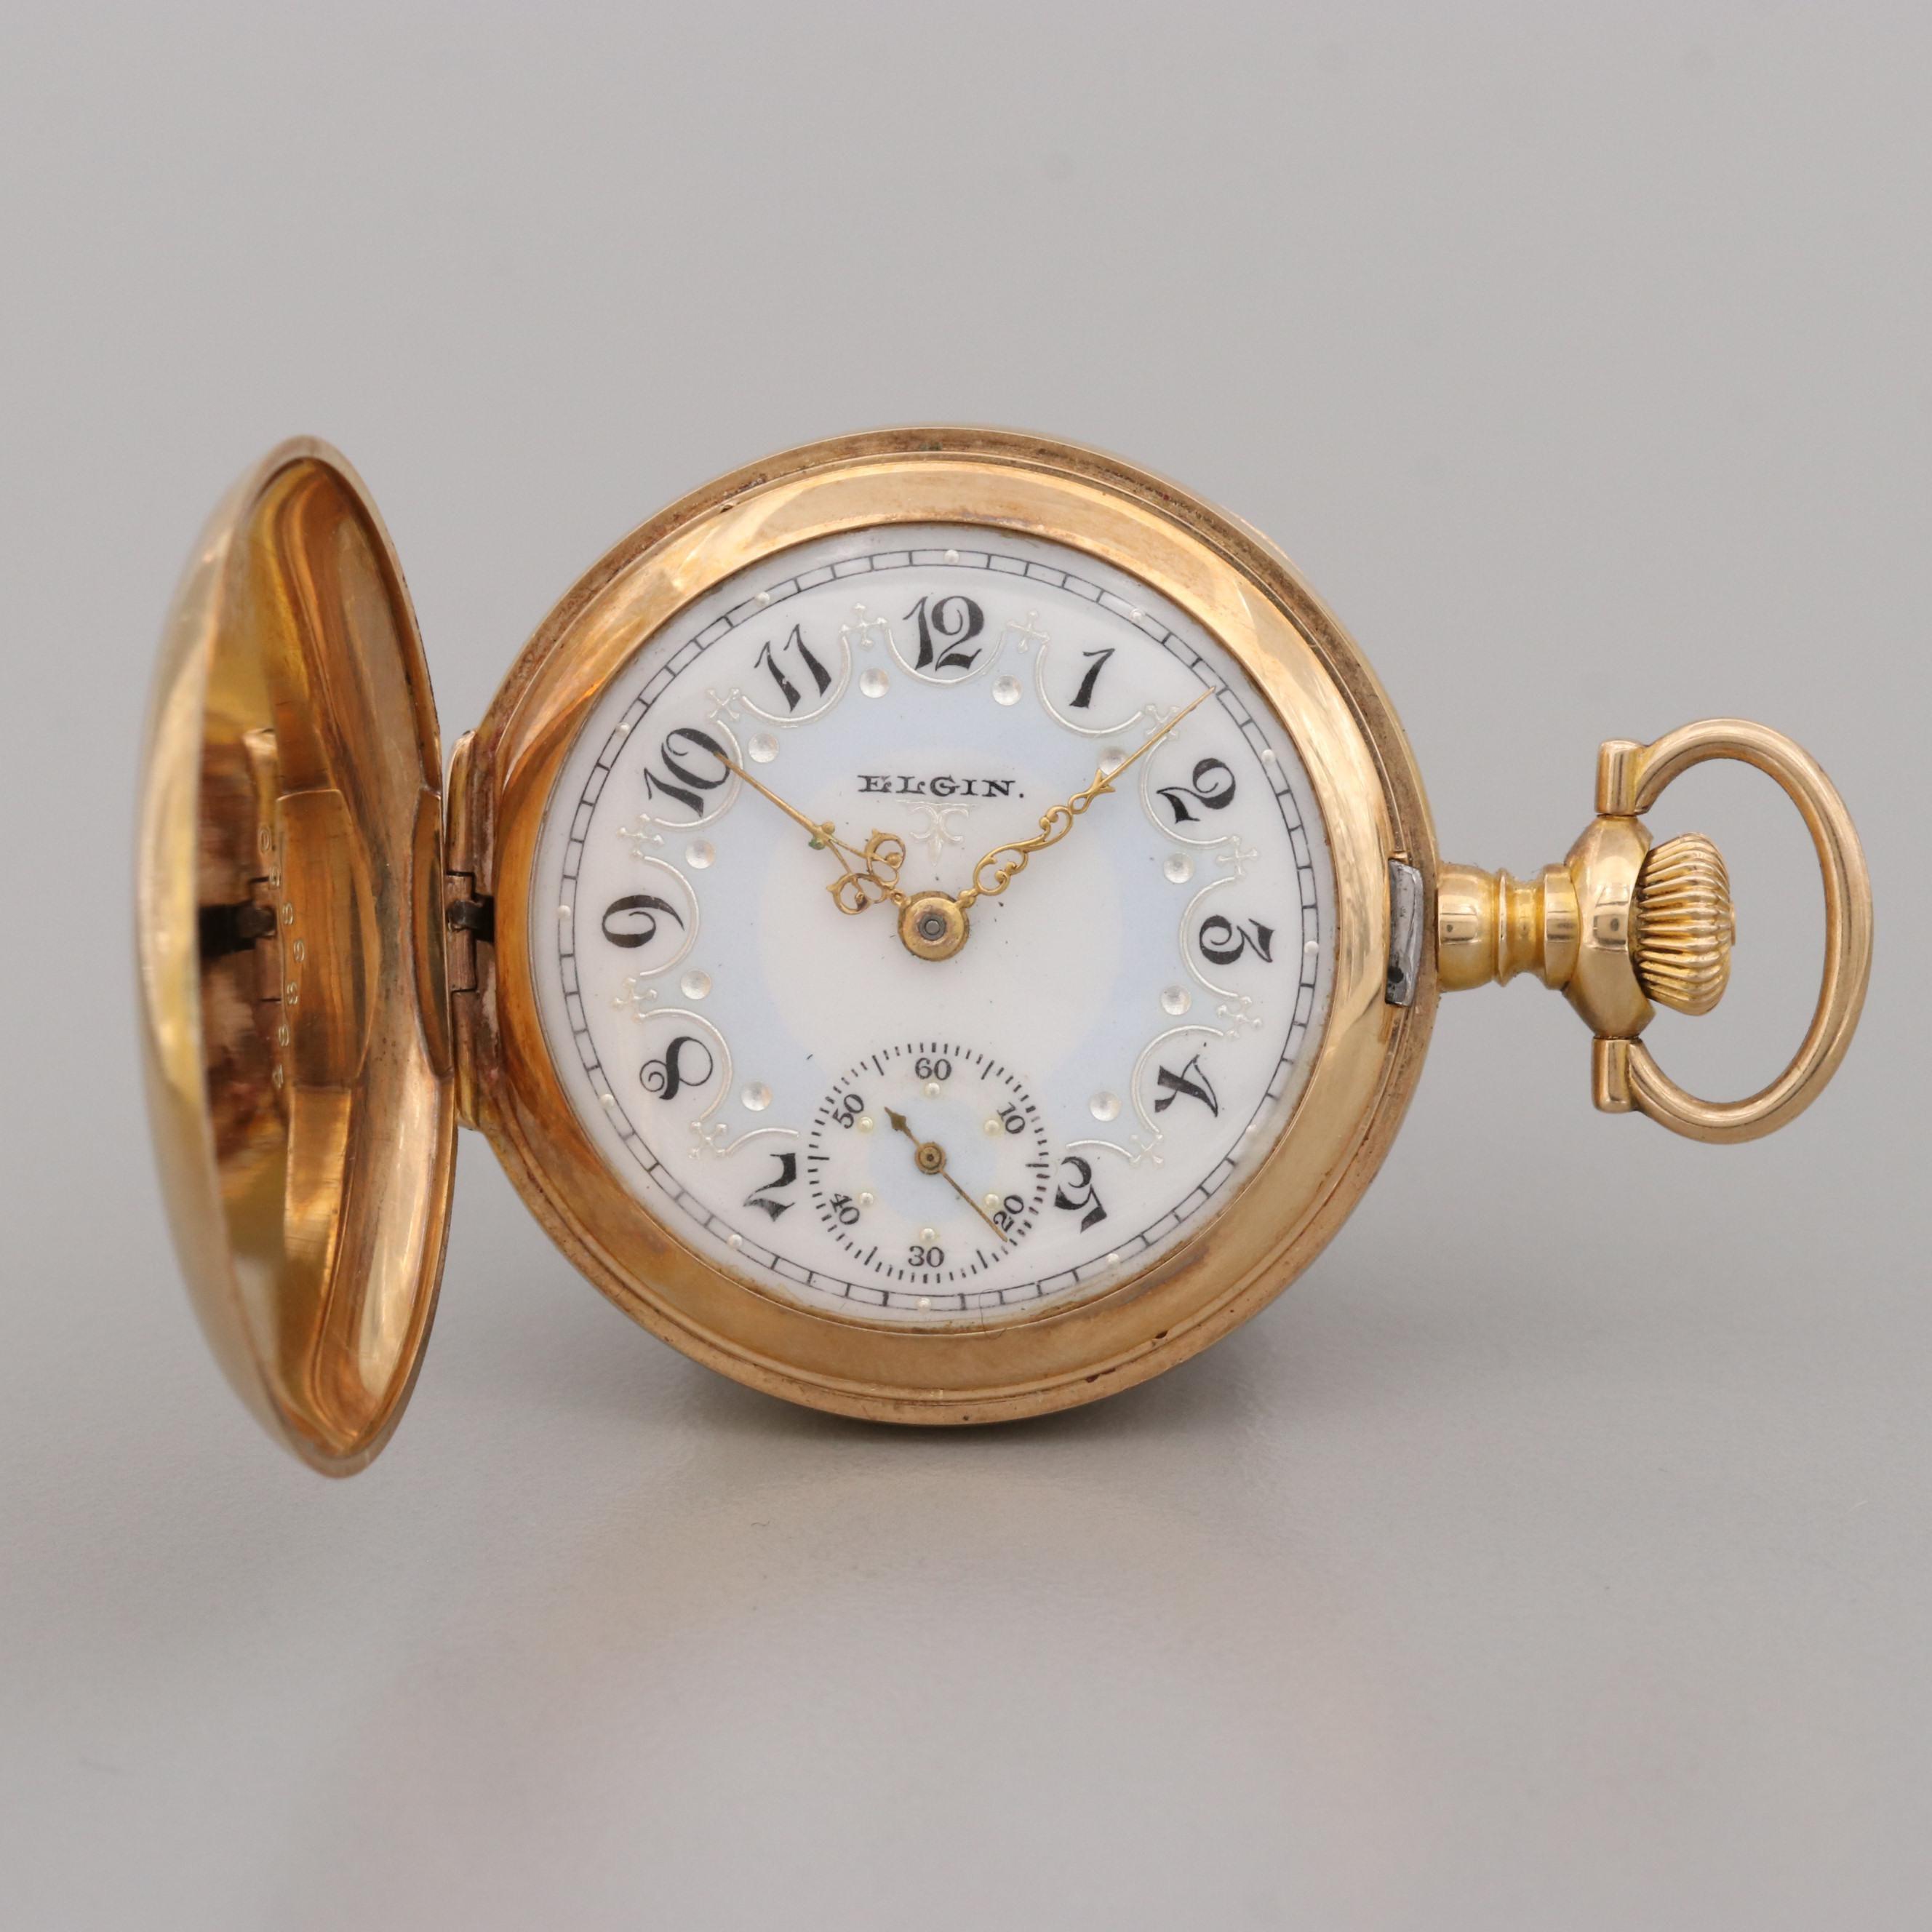 Elgin 14K Yellow Gold Hunting Case Pocket Watch, 1902